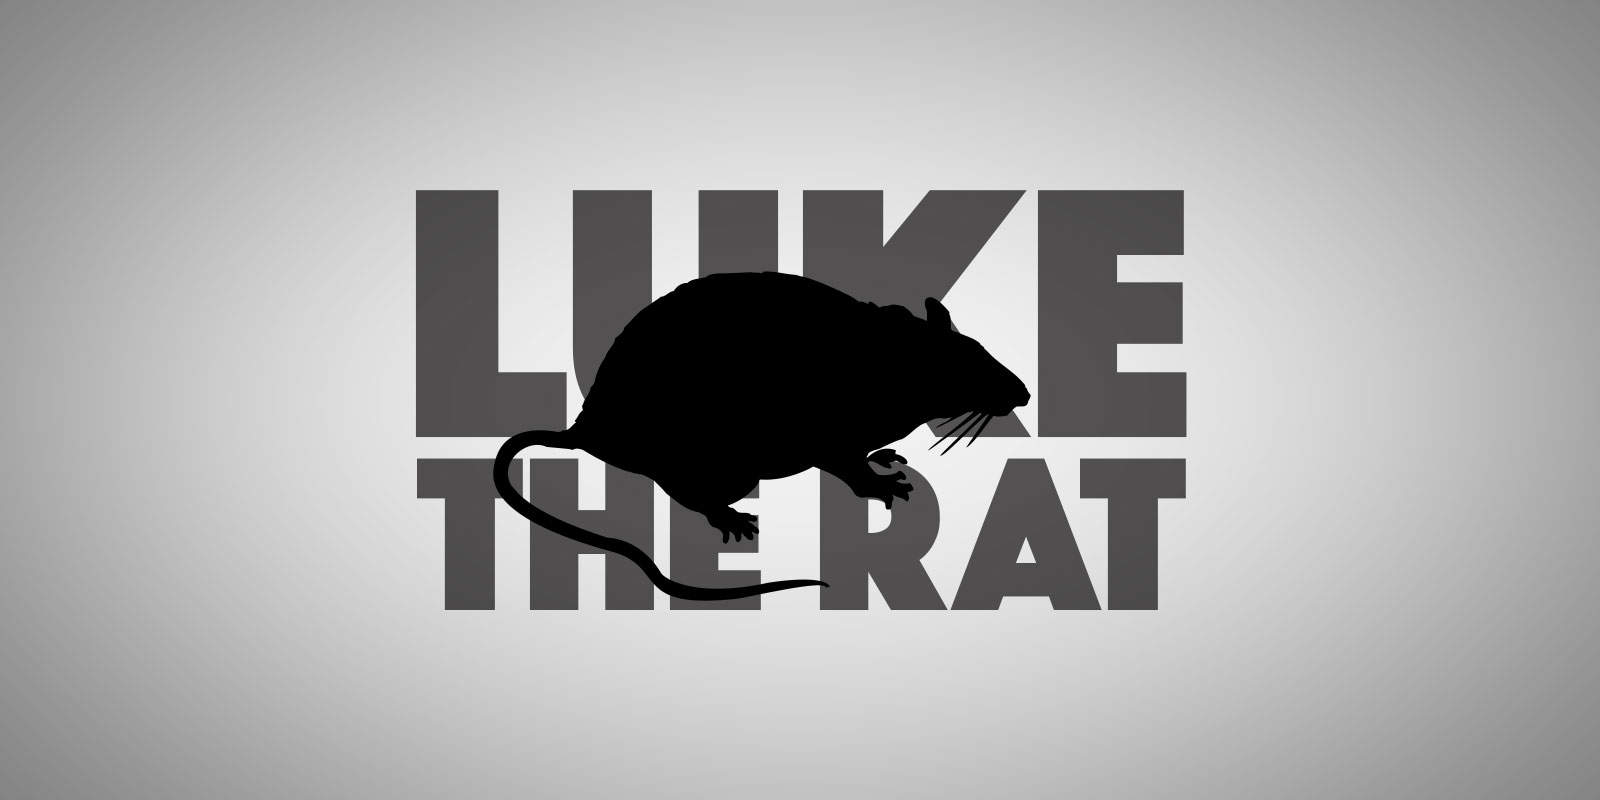 Luke the Rat by Eran Thomson